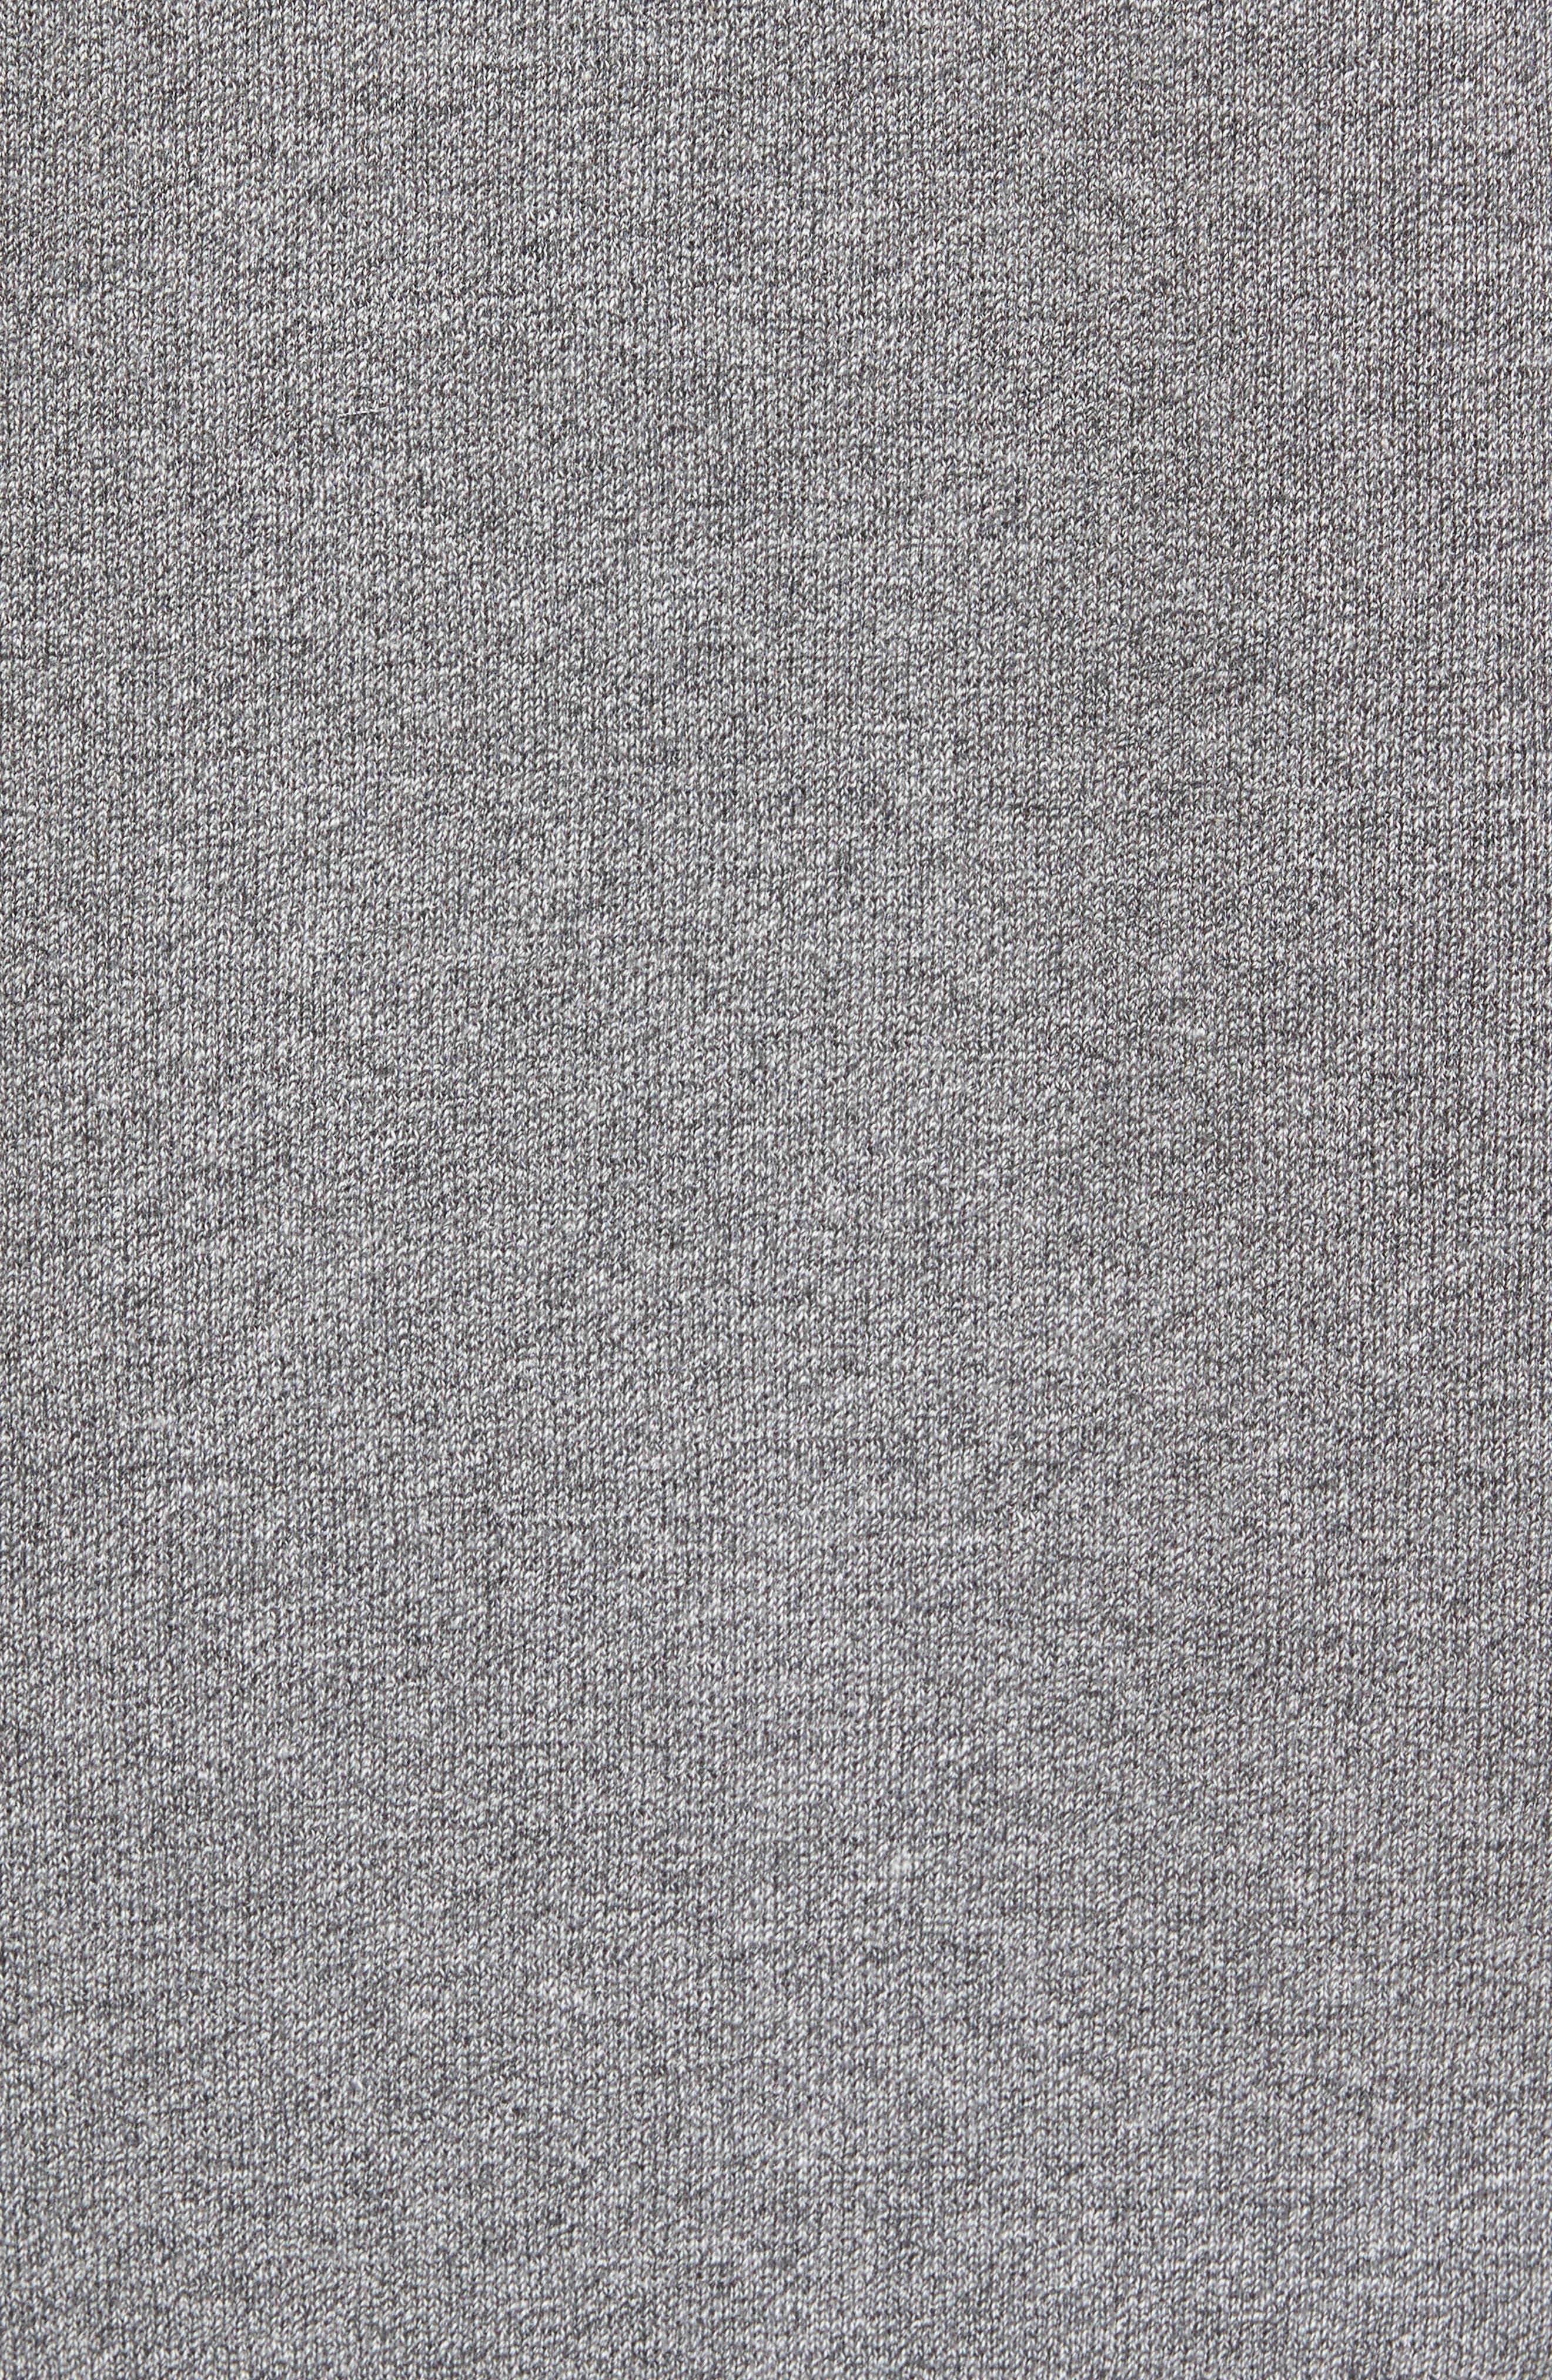 NFL Stitch of Liberty Embroidered Crewneck Sweatshirt,                             Alternate thumbnail 125, color,